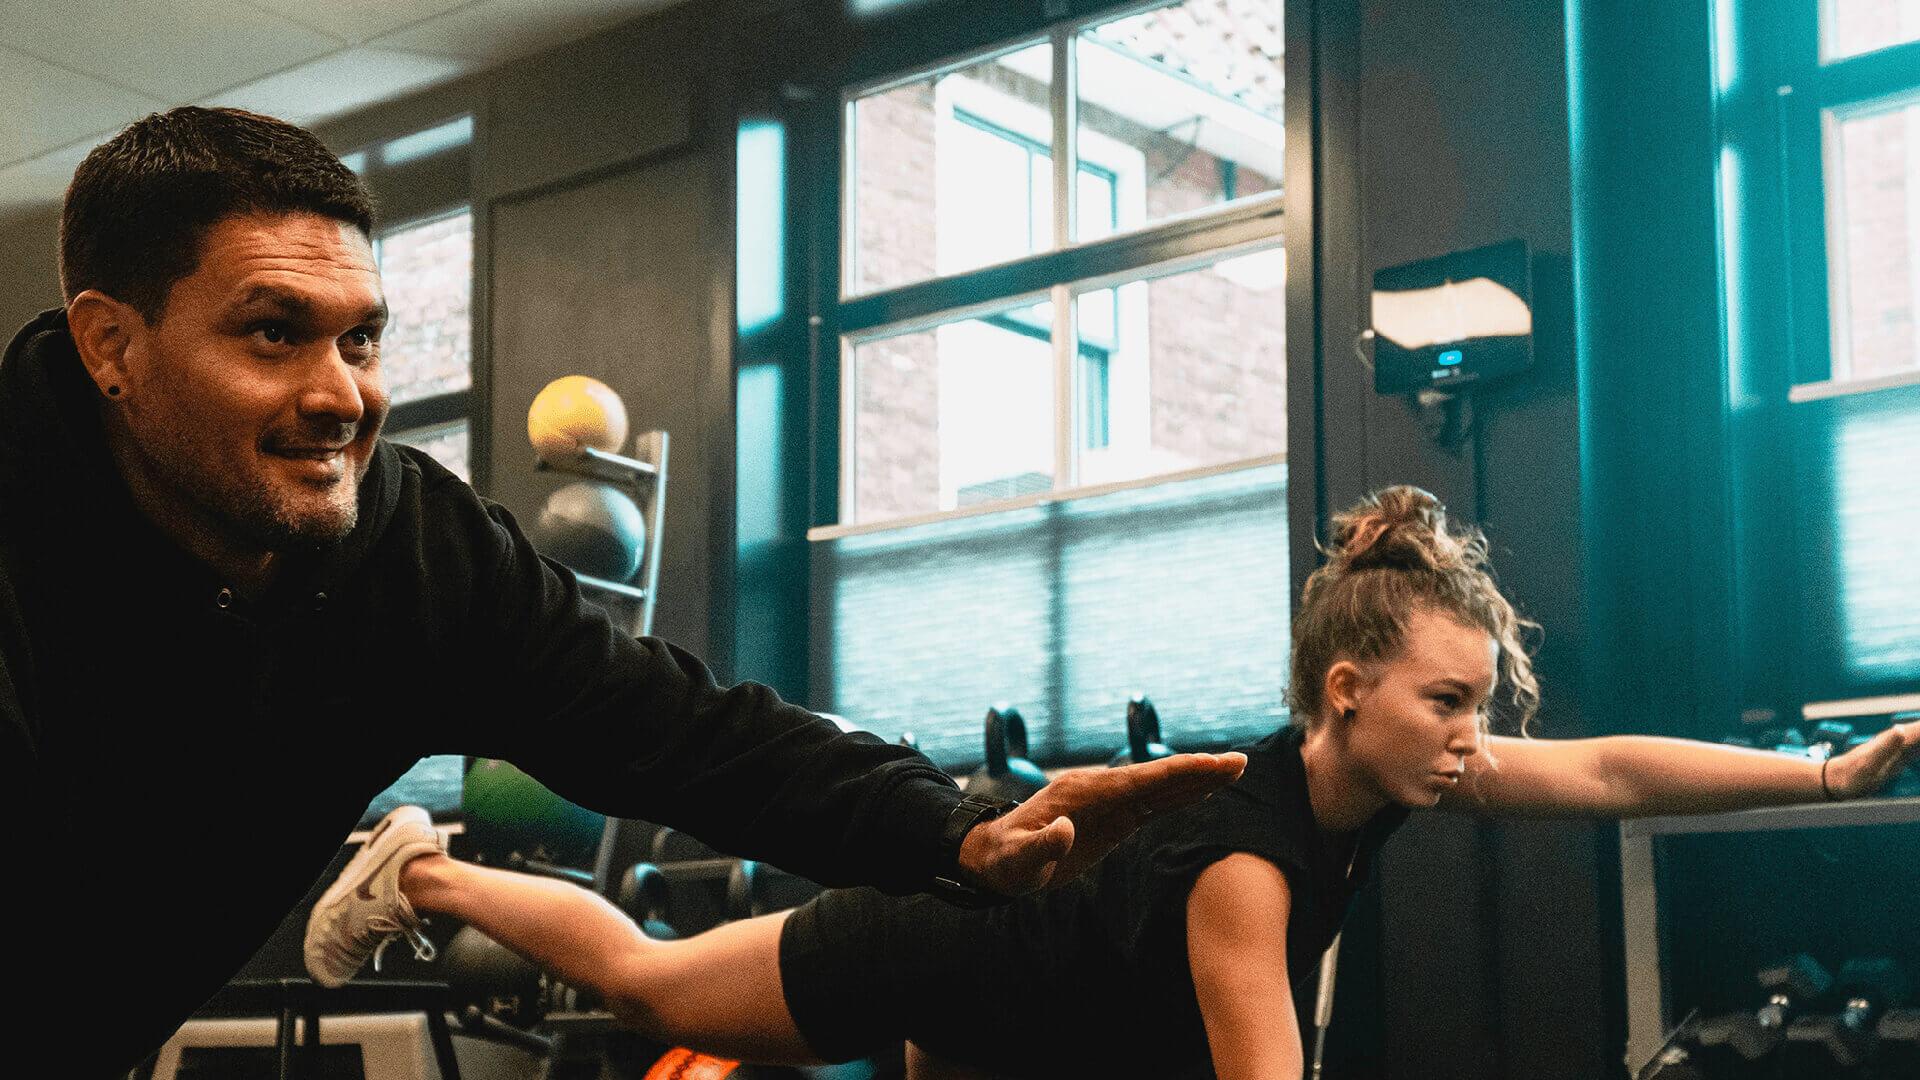 Personal Training Duo Bij S.t.a.r.s Groningen | Personal Trainer | Groningen - Haren - Zuidhorn